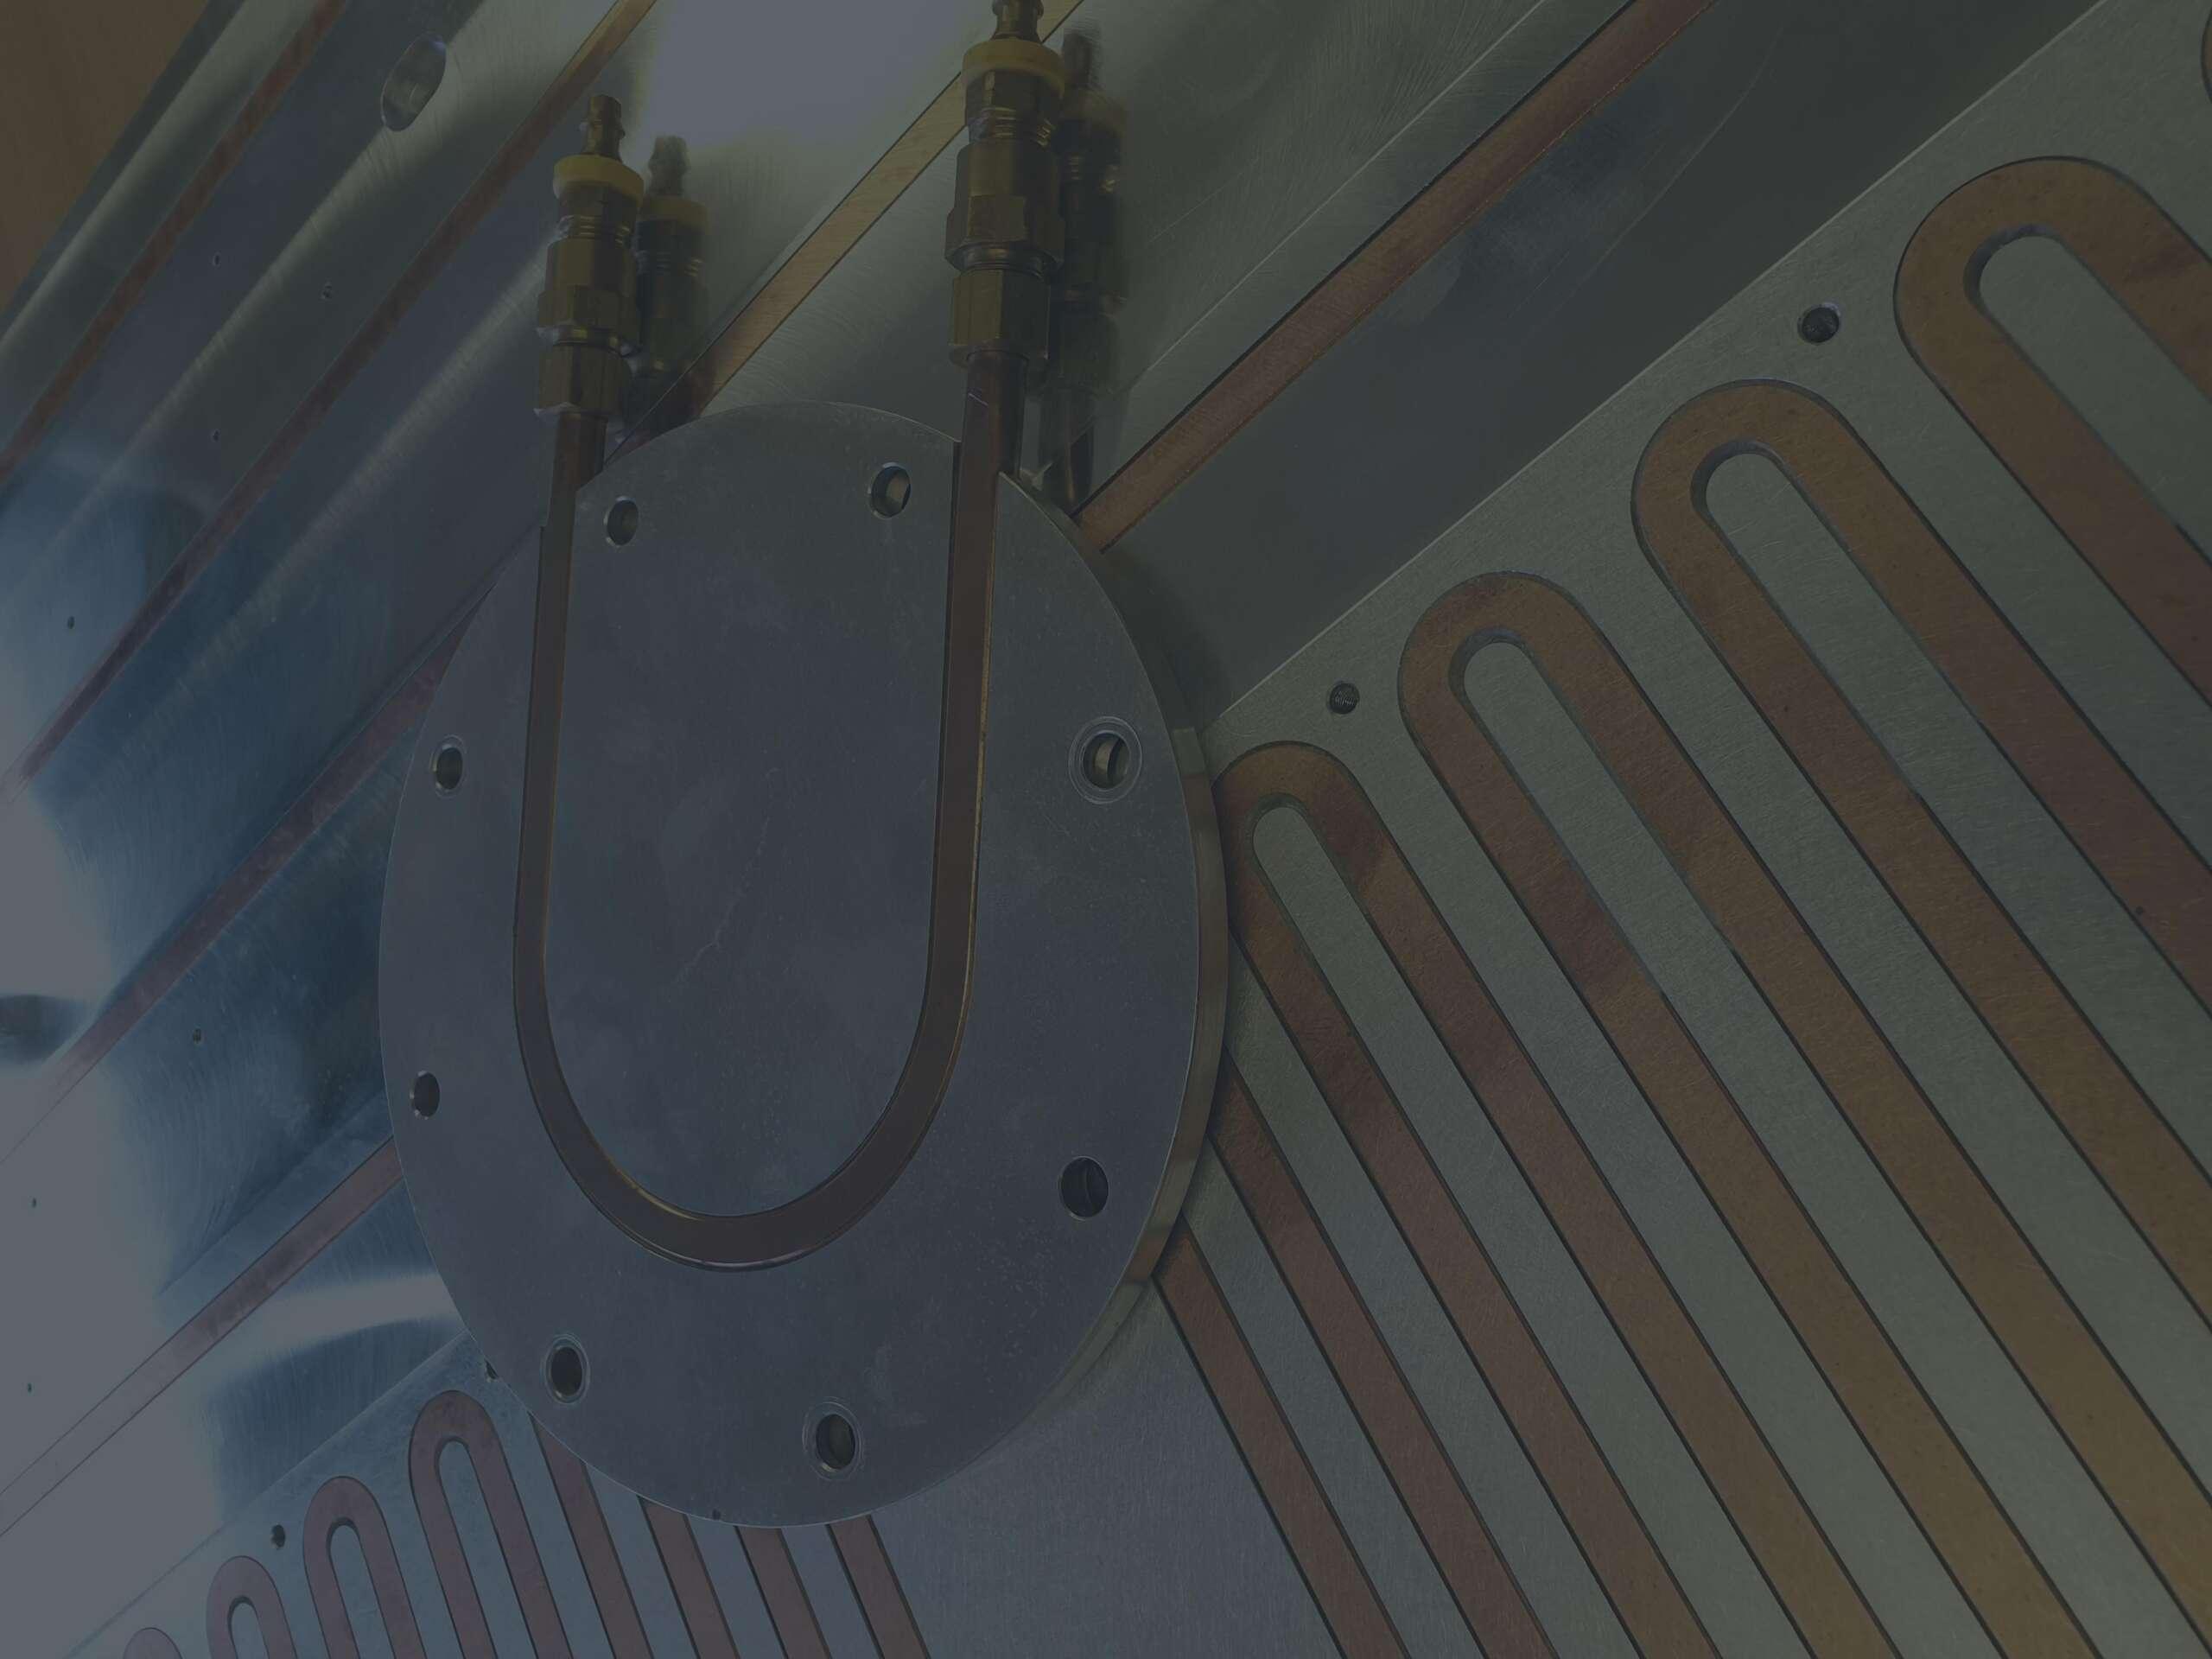 Liquid-Cooled Plates Manufacturer1